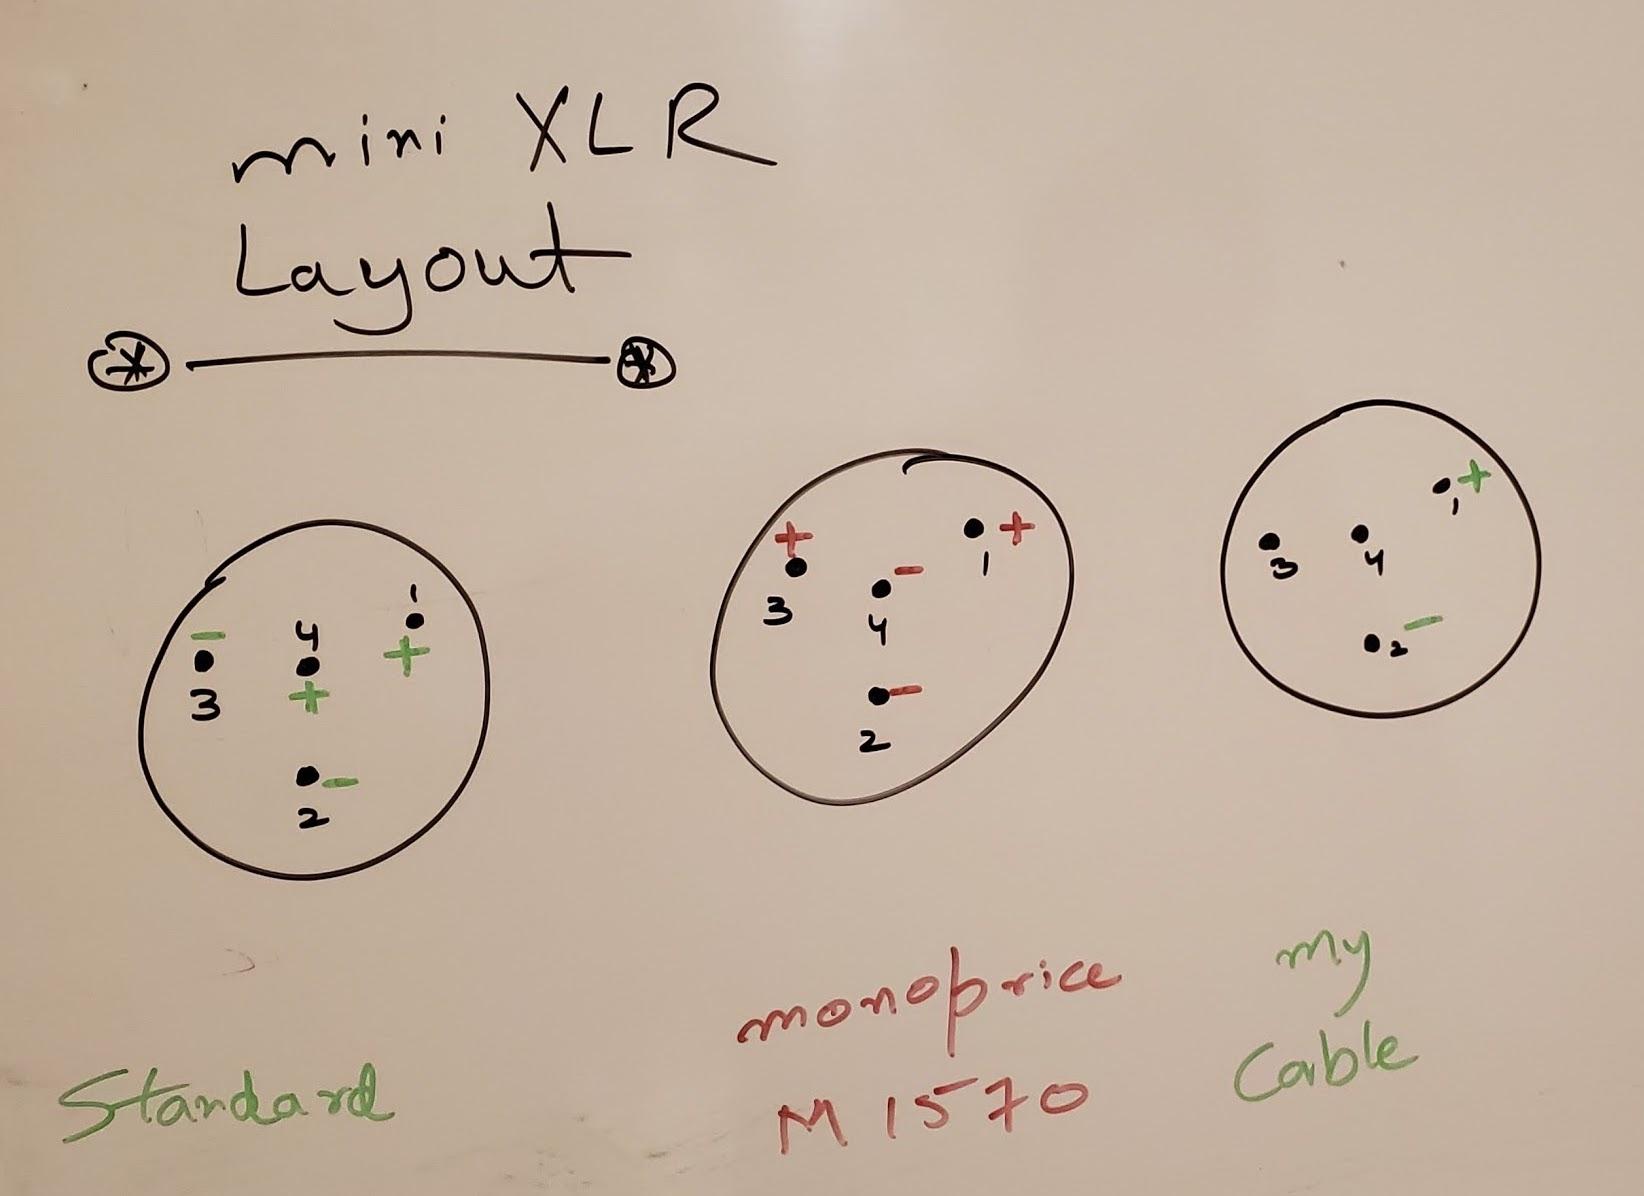 4 Pin Audeze Xlr Wiring Diagram | Wiring Diagram Re L Wiring Diagram on 120 208 3 phase diagram, 208 volt three-way system diagram, 120 volt outlet diagram, 120 wiring symbols, 120 wiring color, 120 240 3 phase diagram,